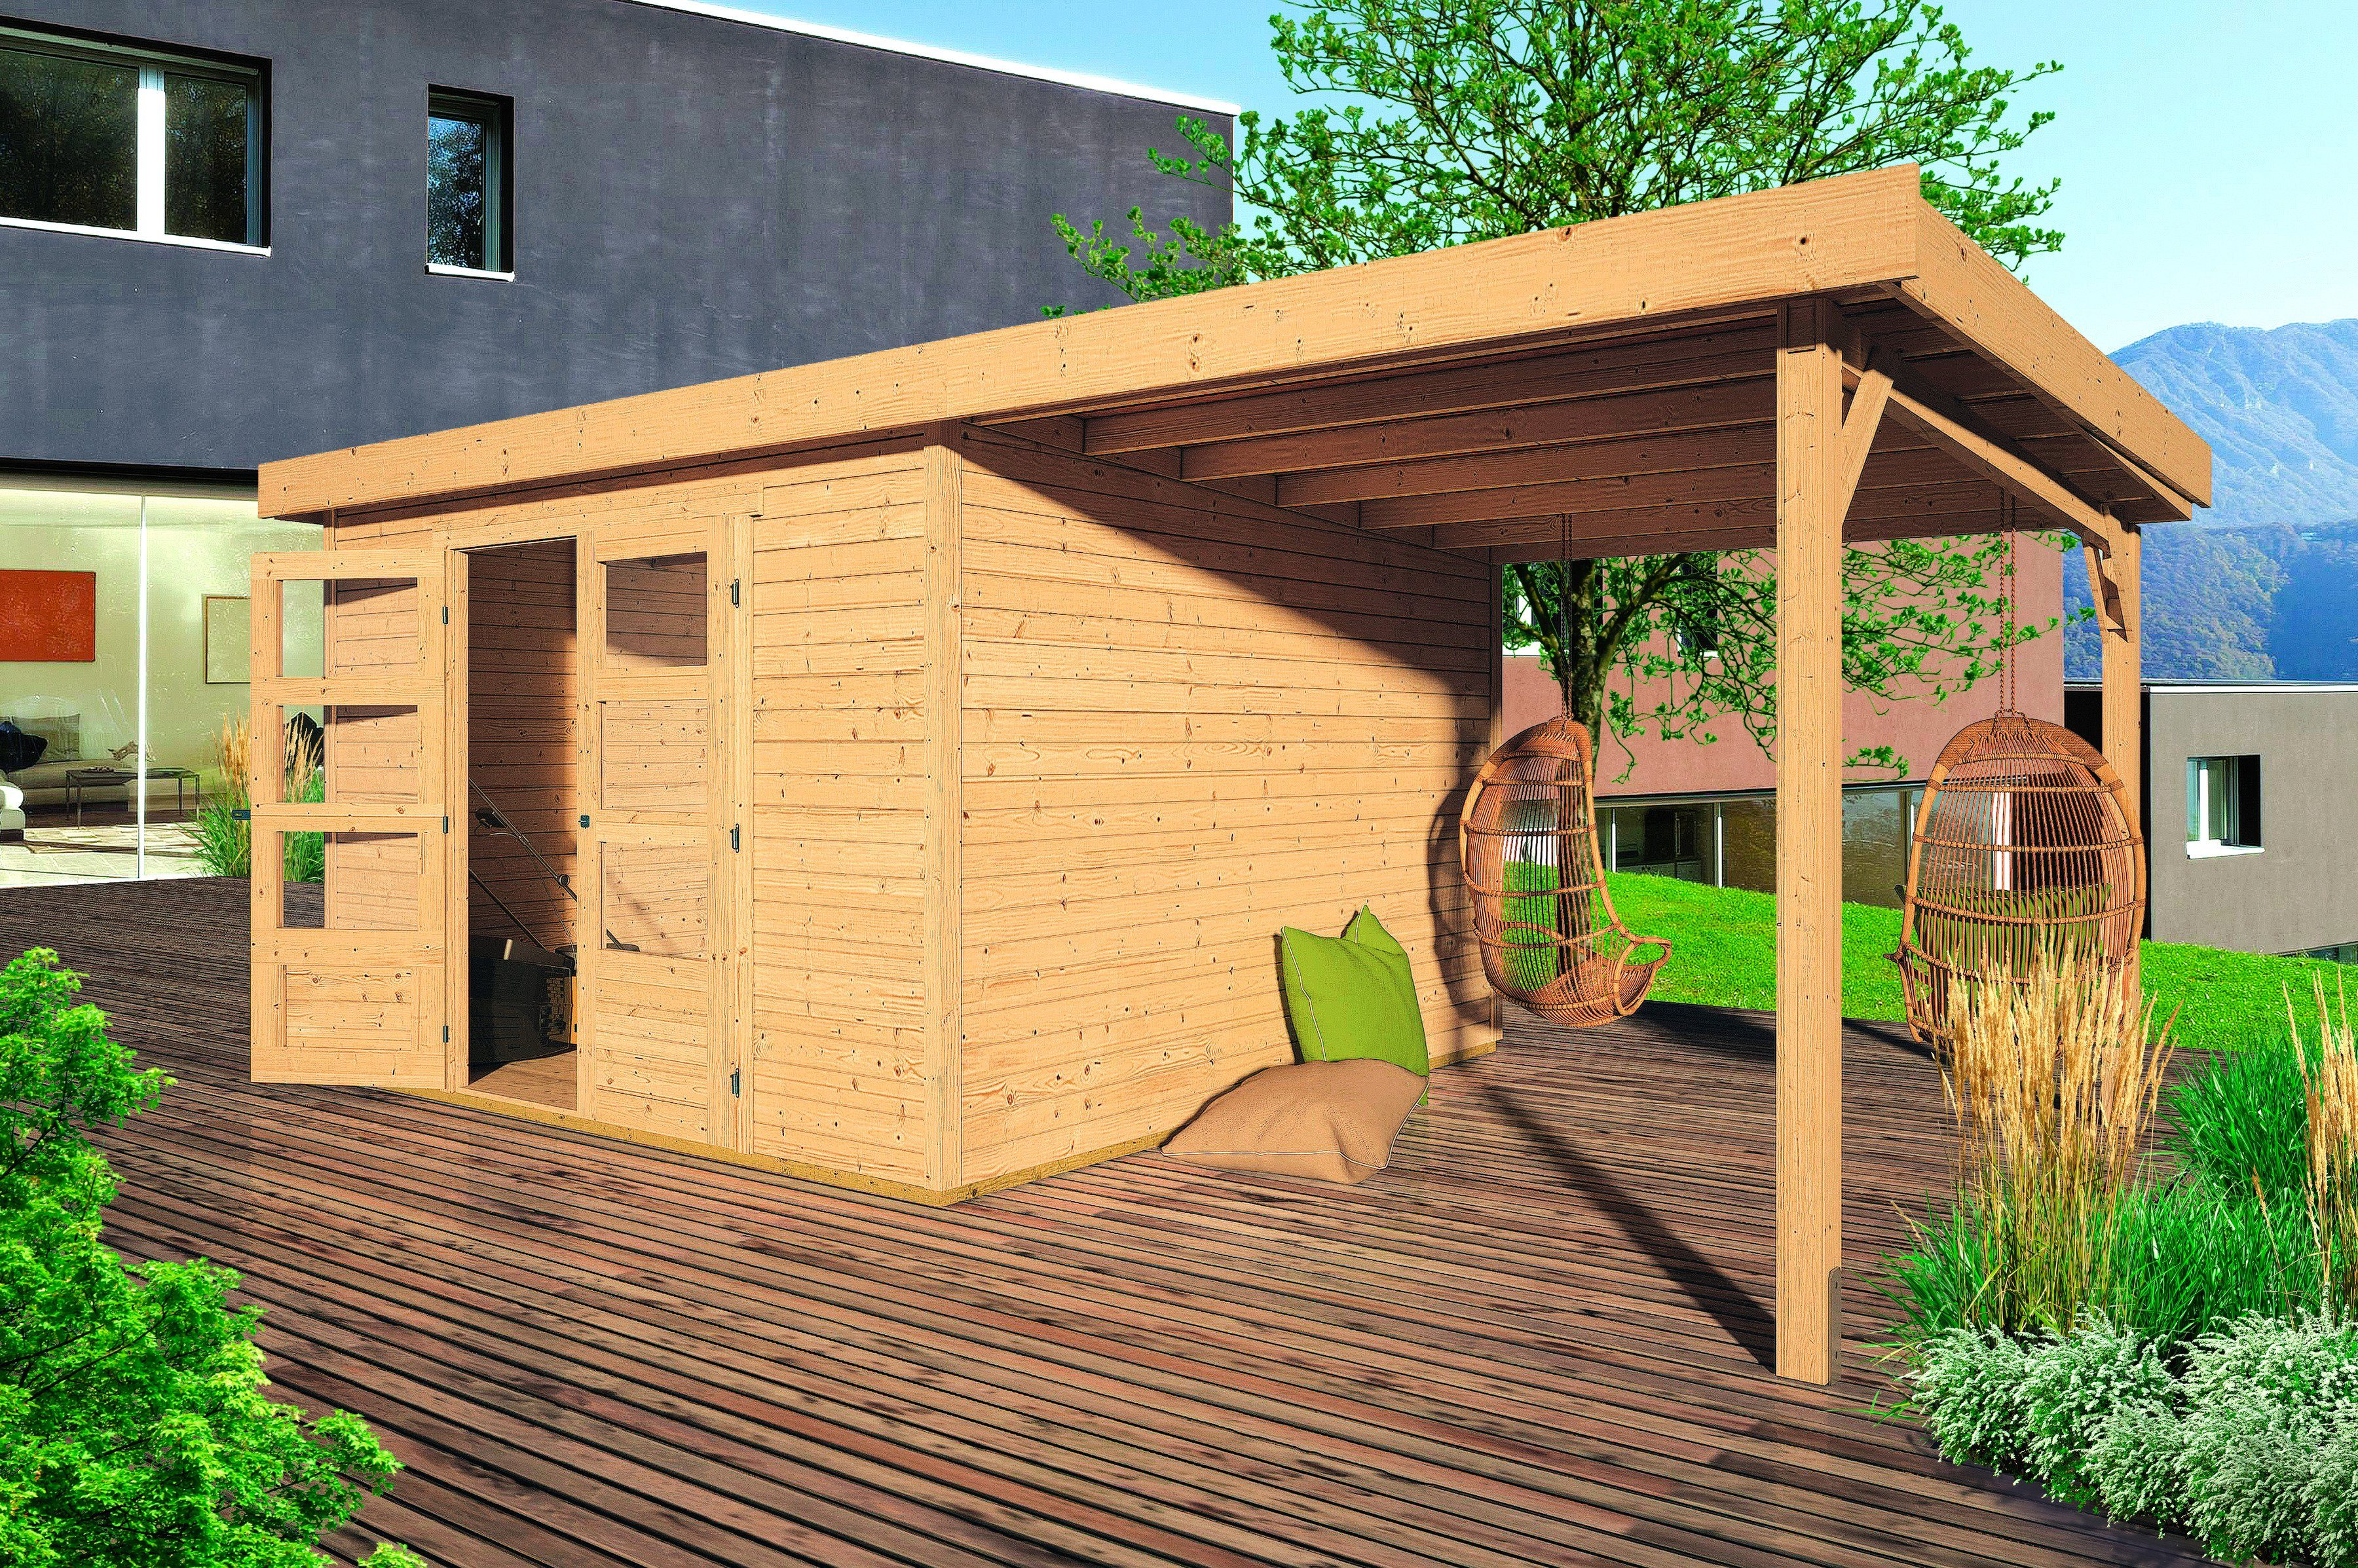 KARIBU Gartenhaus »Arnis 4«, BxT: 302x242 cm, inkl. Aufbau und Anbau (220 cm breite)